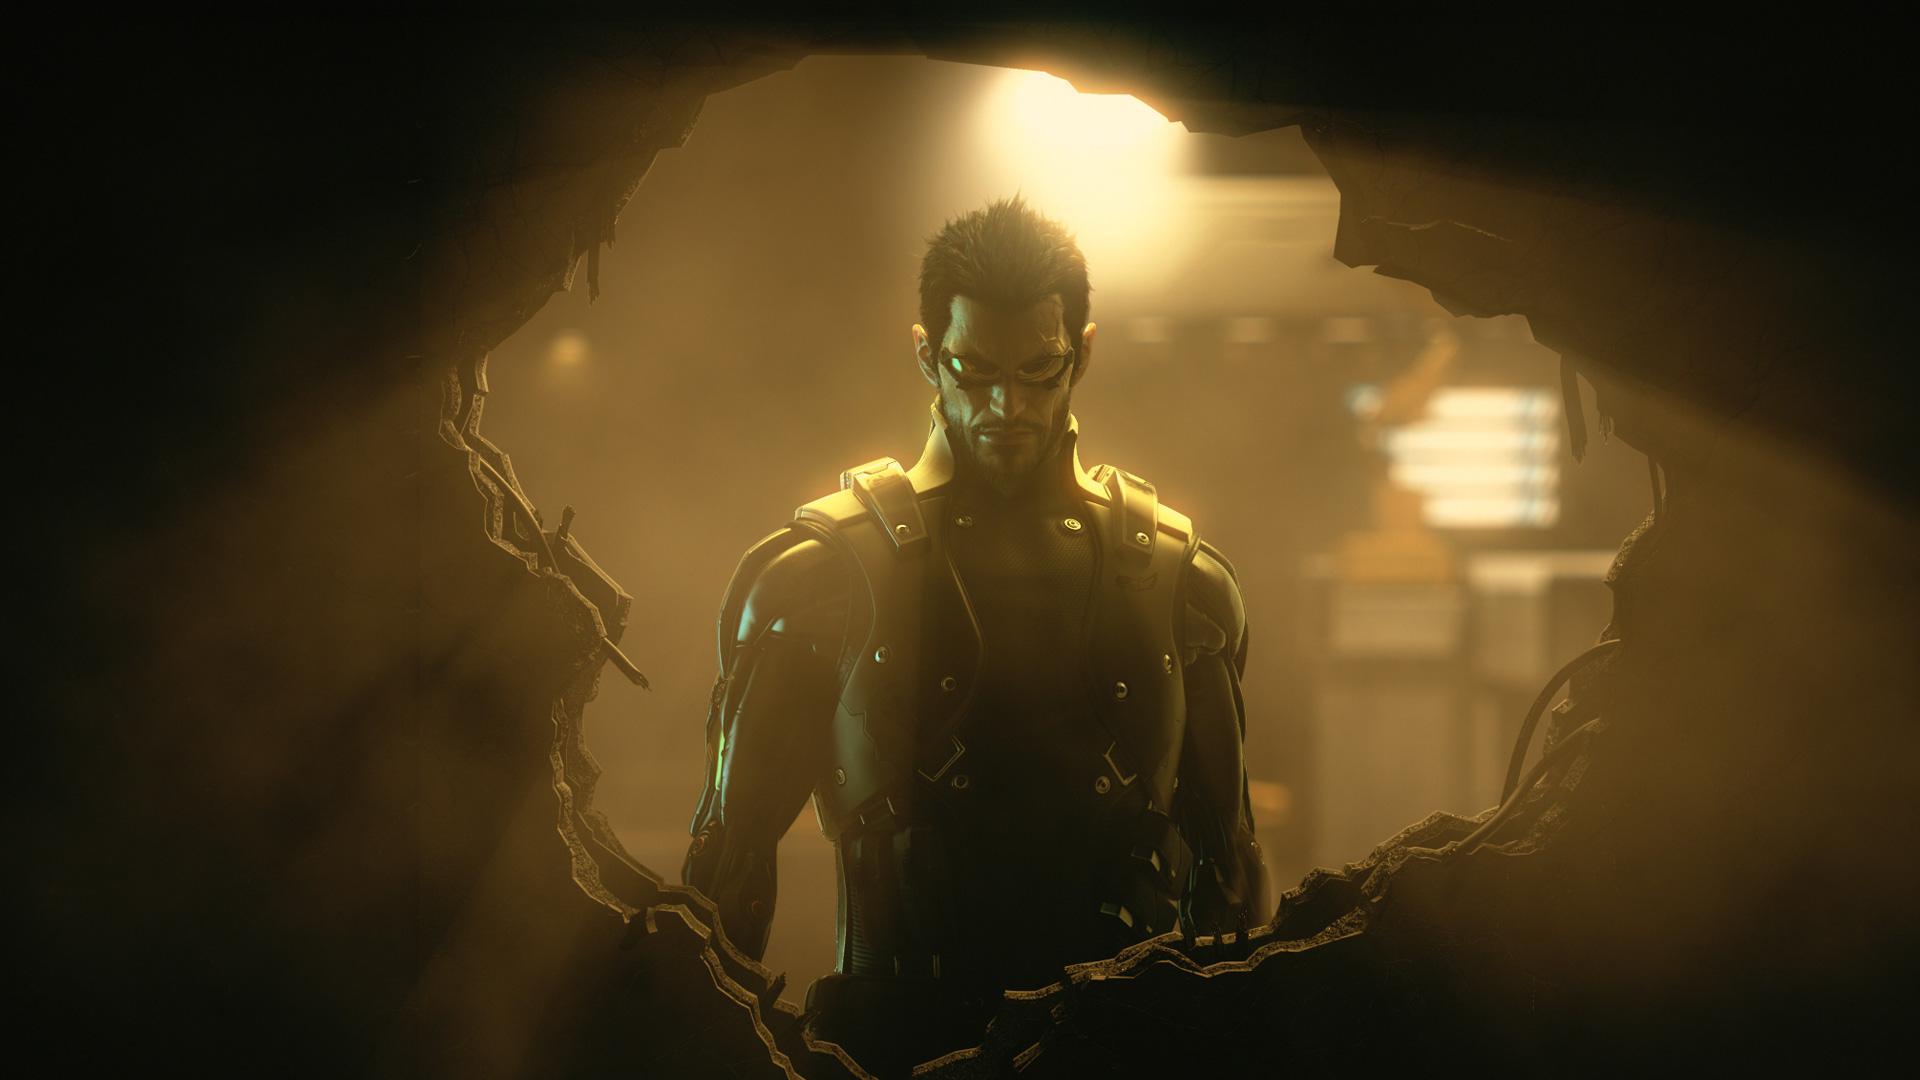 5c226562899bb46a33ff67f7b9f332cf39609ef5.jpg - Deus Ex: Human Revolution